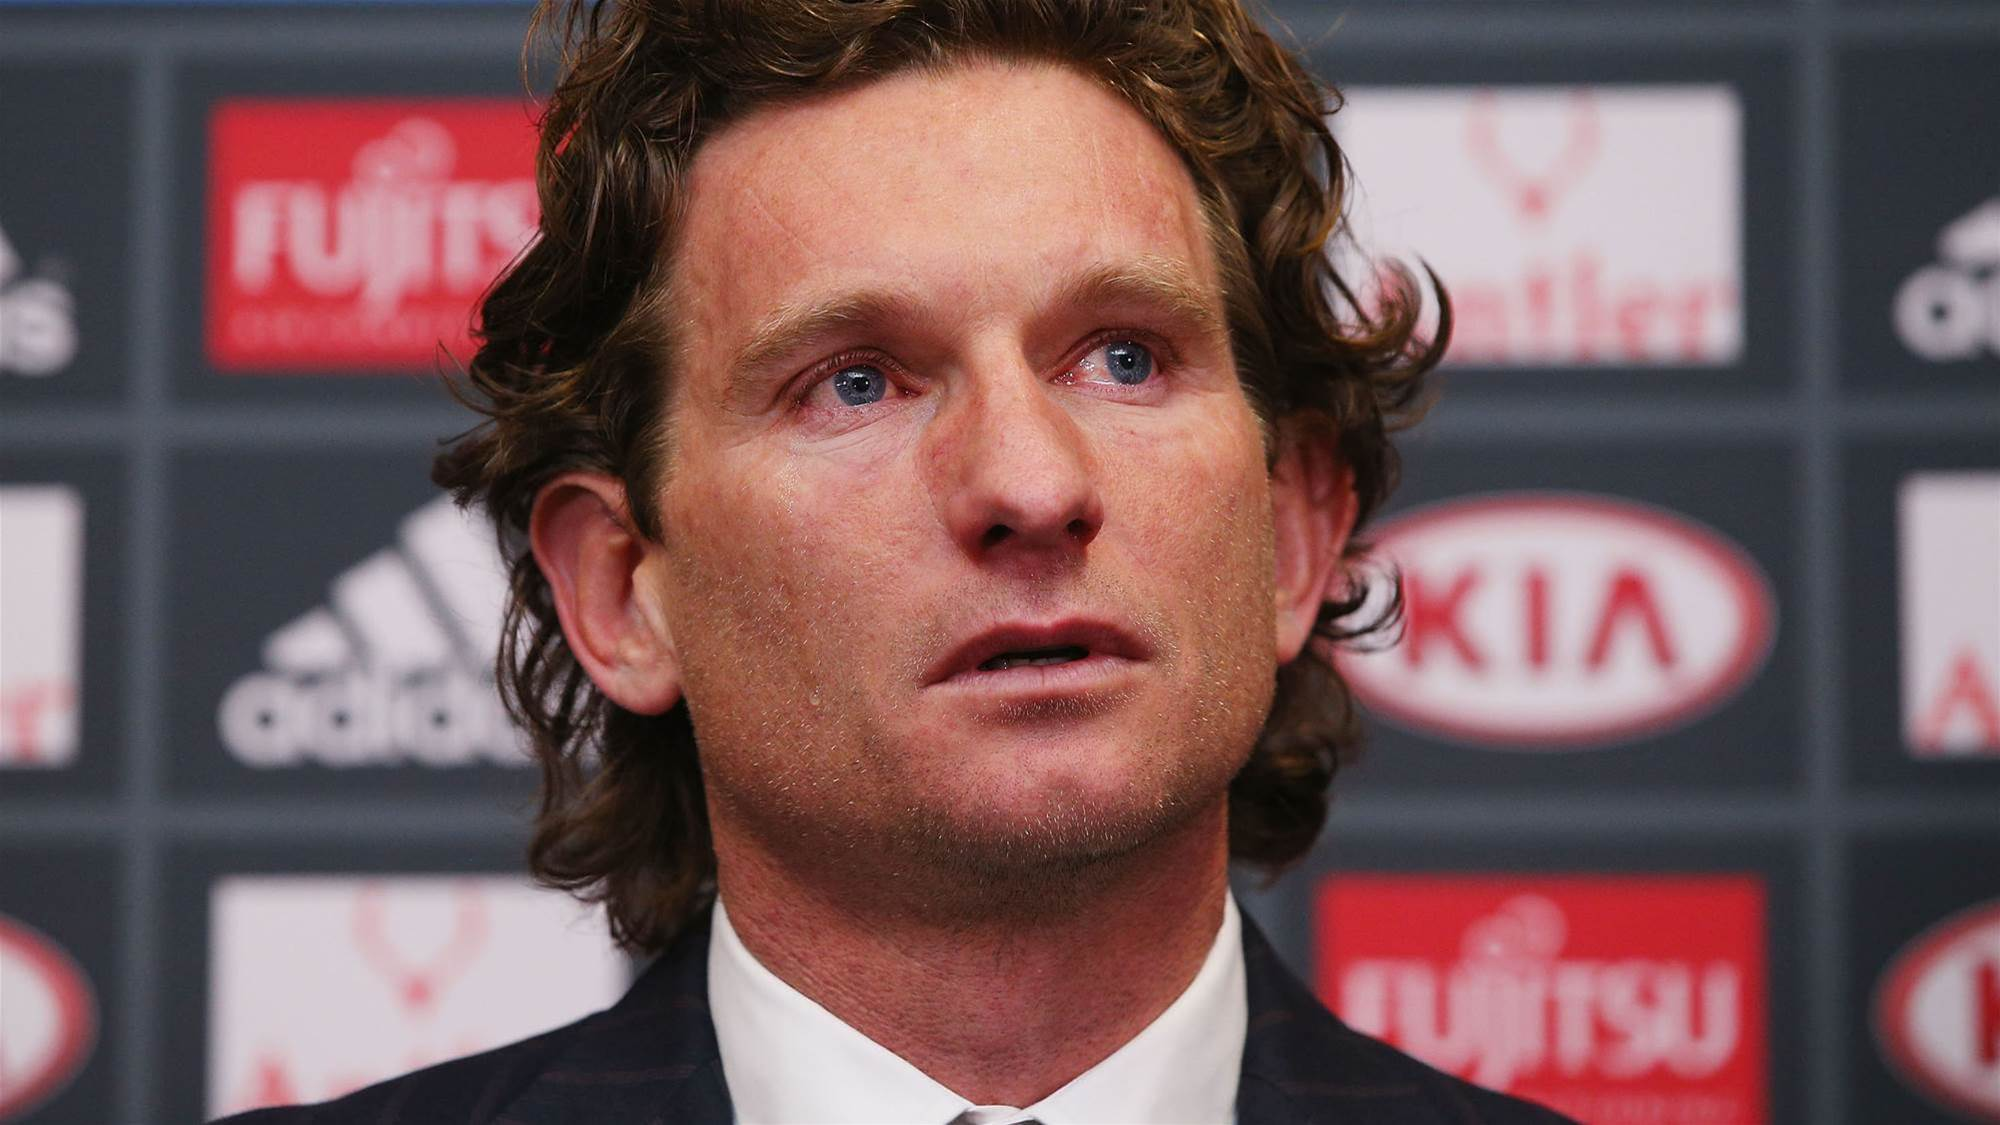 Former coach blasts AFL over Hird silence